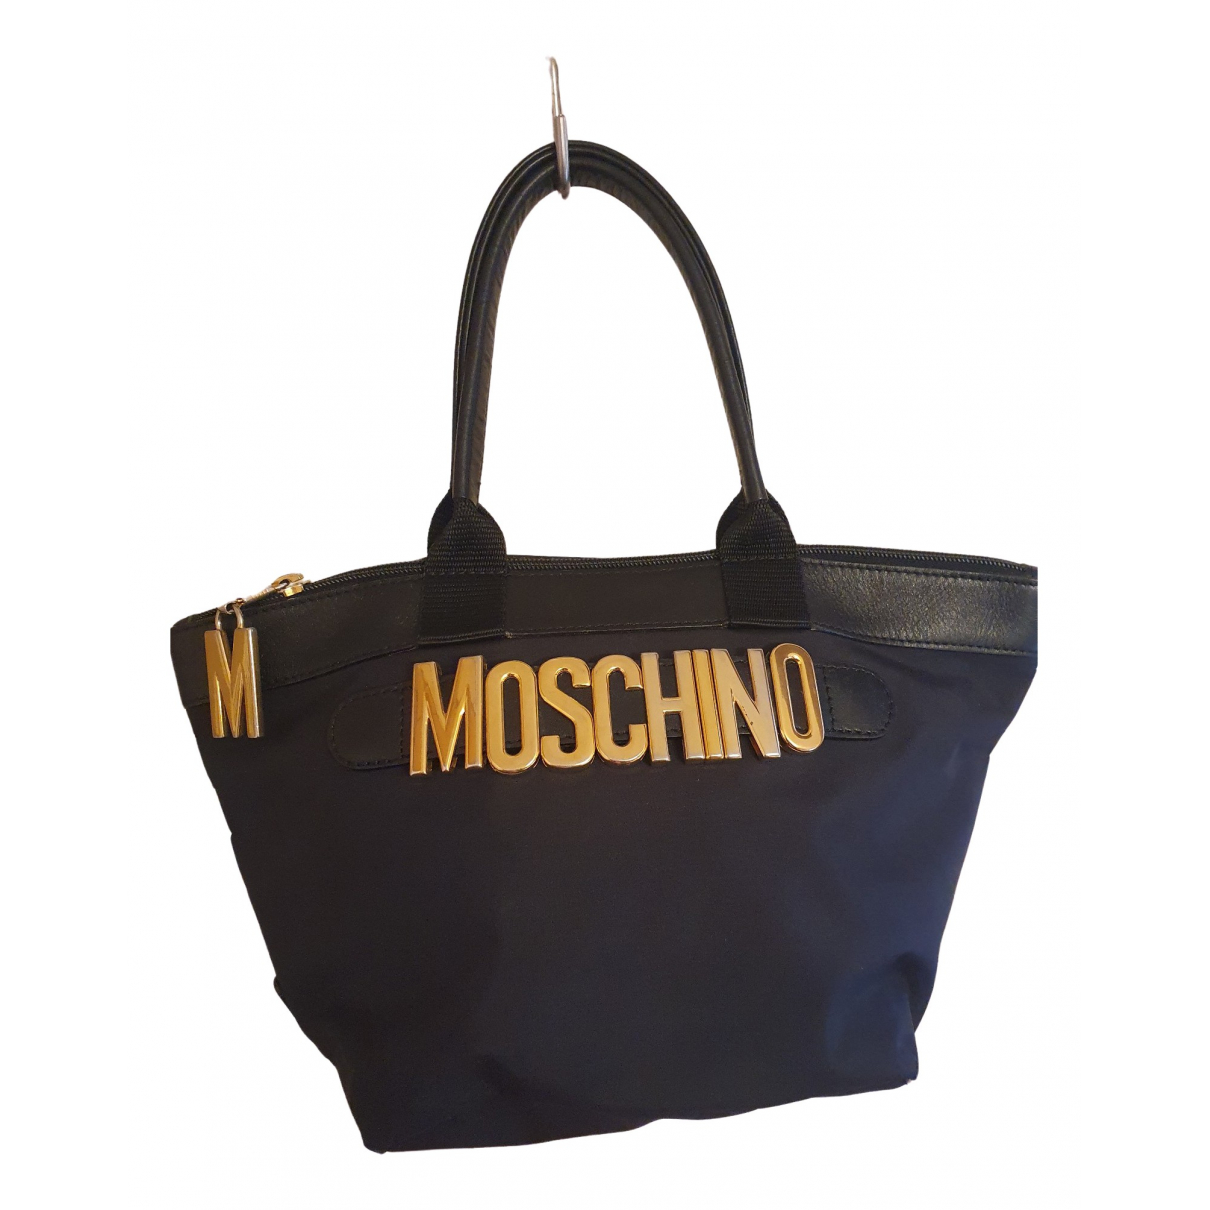 Moschino \N Black handbag for Women \N